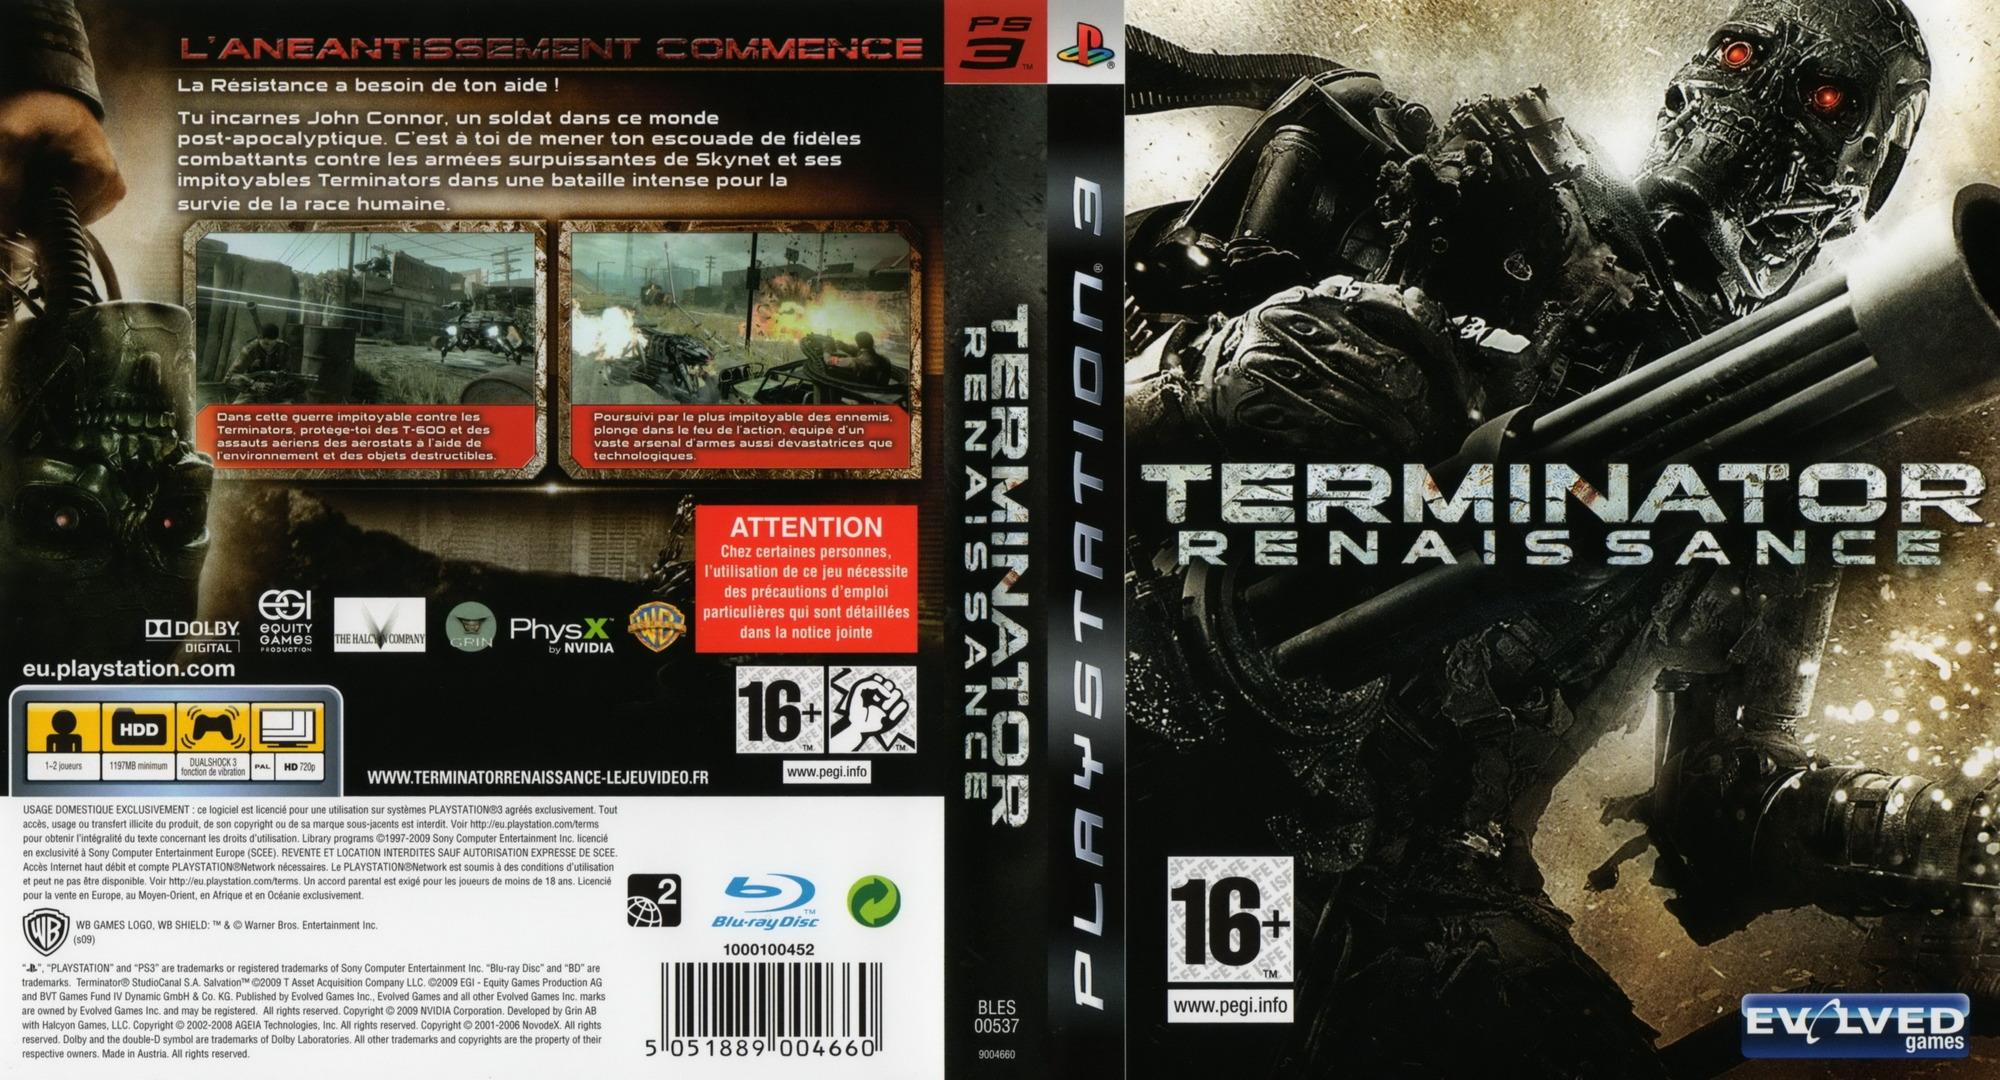 Terminator Renaissance PS3 coverfullHQ (BLES00537)